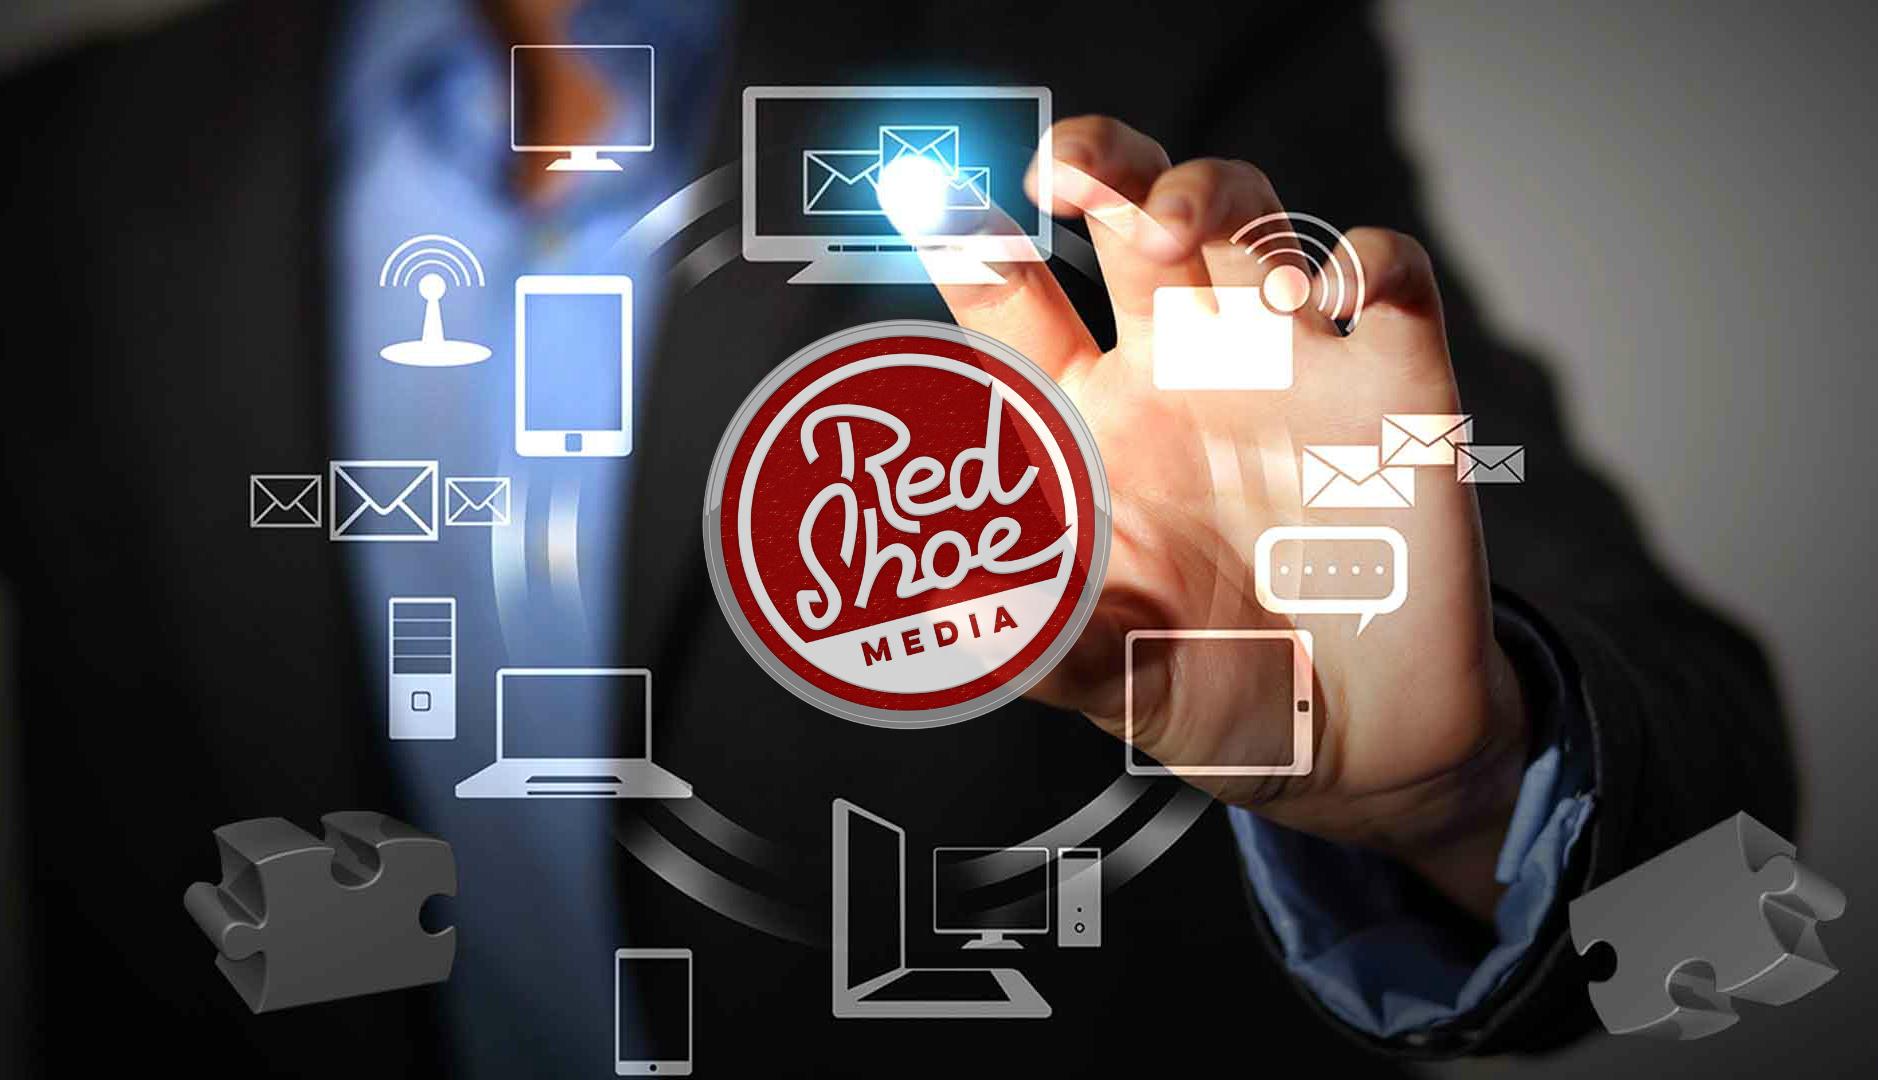 Website Design, Social Media Marketing   Red Shoe Media